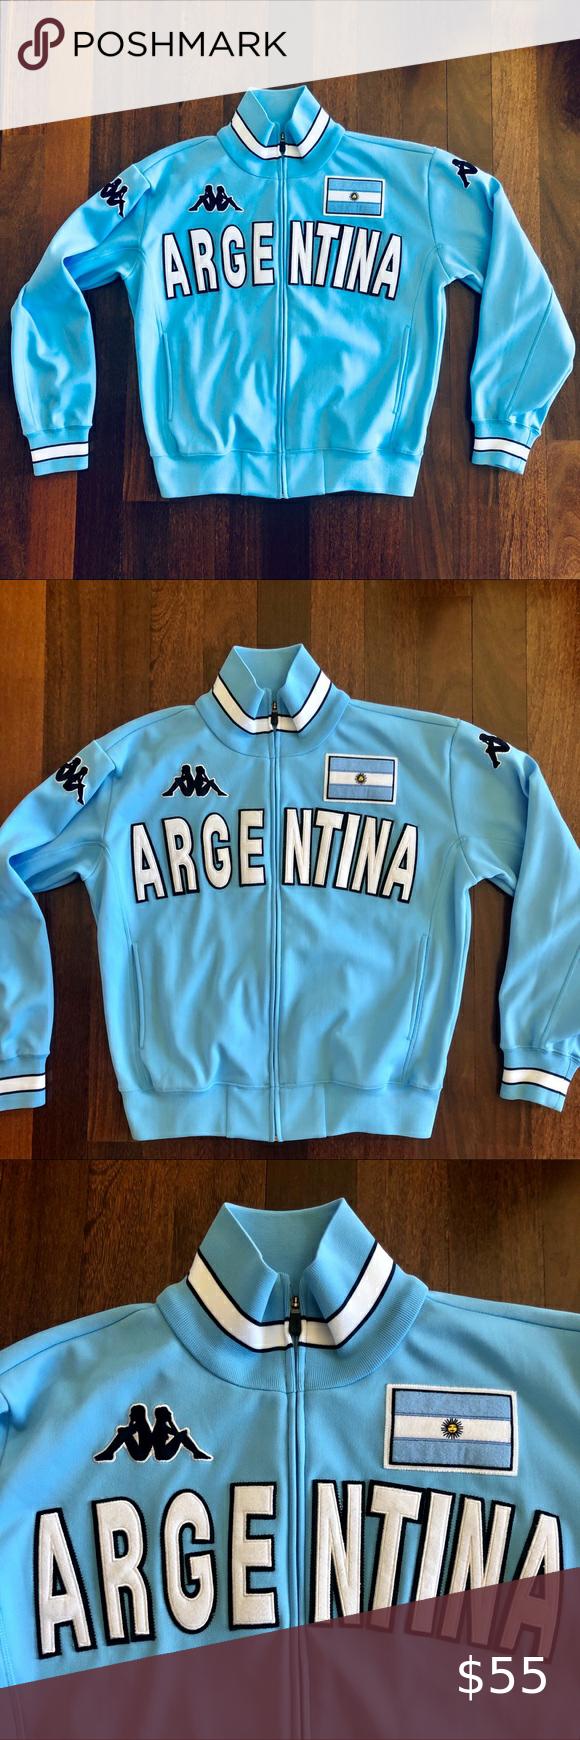 impactante sirena Persona enferma  Kappa Argentina Jacket in 2020 | Jackets, How to wear, Kappa